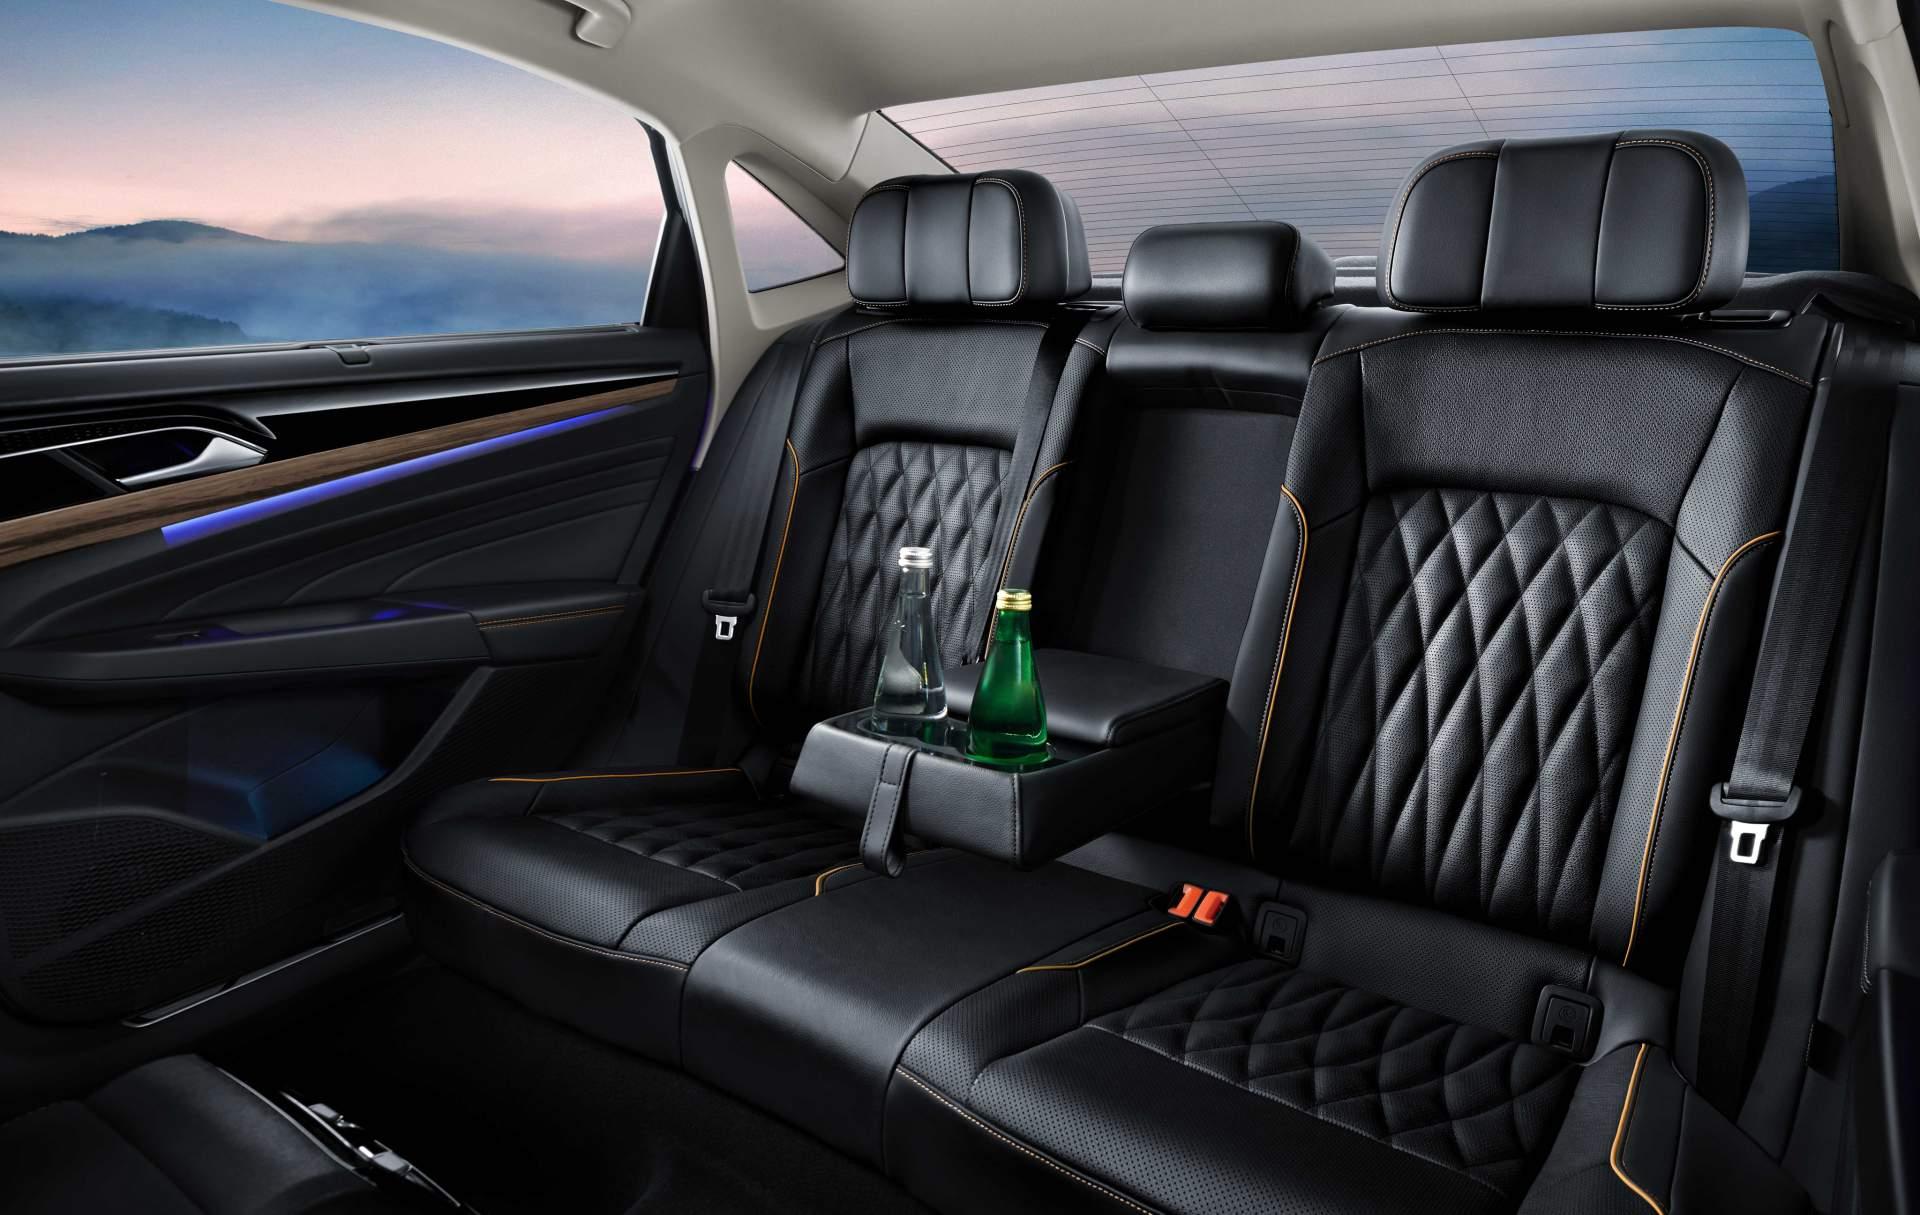 2019 Volkswagen Passat Revealed In China Previews U S Model